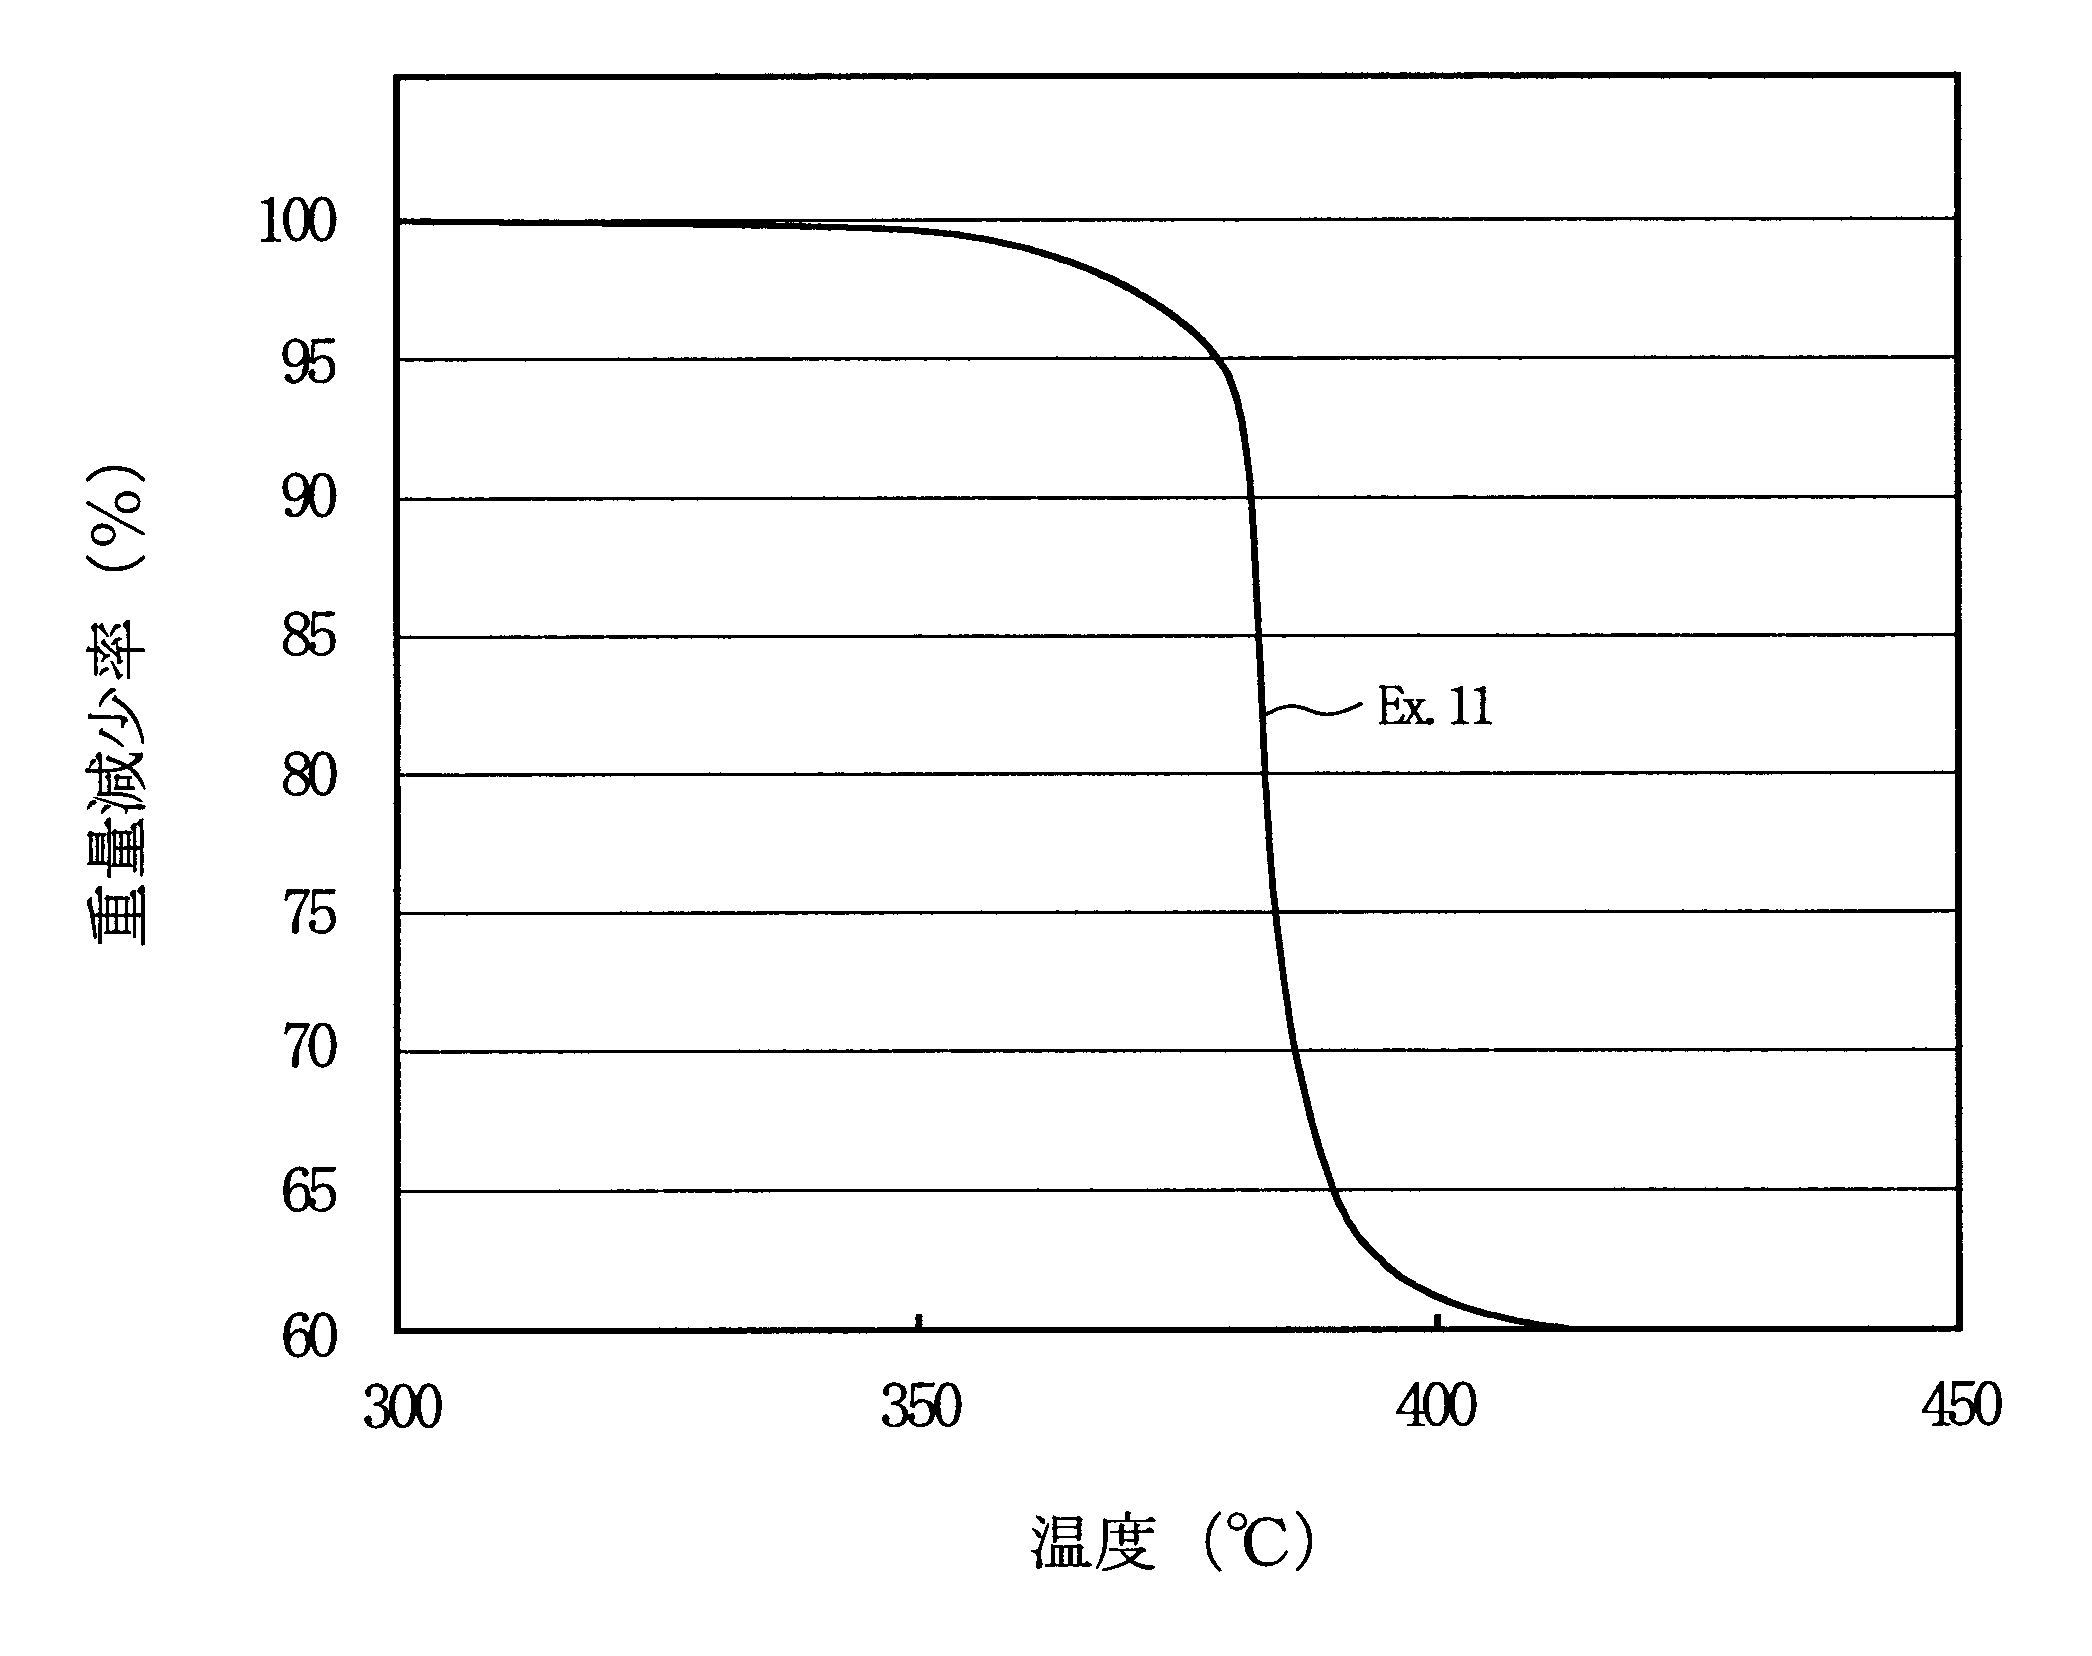 WO2010122936A1 - ポリフッ化ビニリデン樹脂組成物、白色樹脂フィルム、及び太陽電池モジュール用バックシート         - Google PatentsFamily